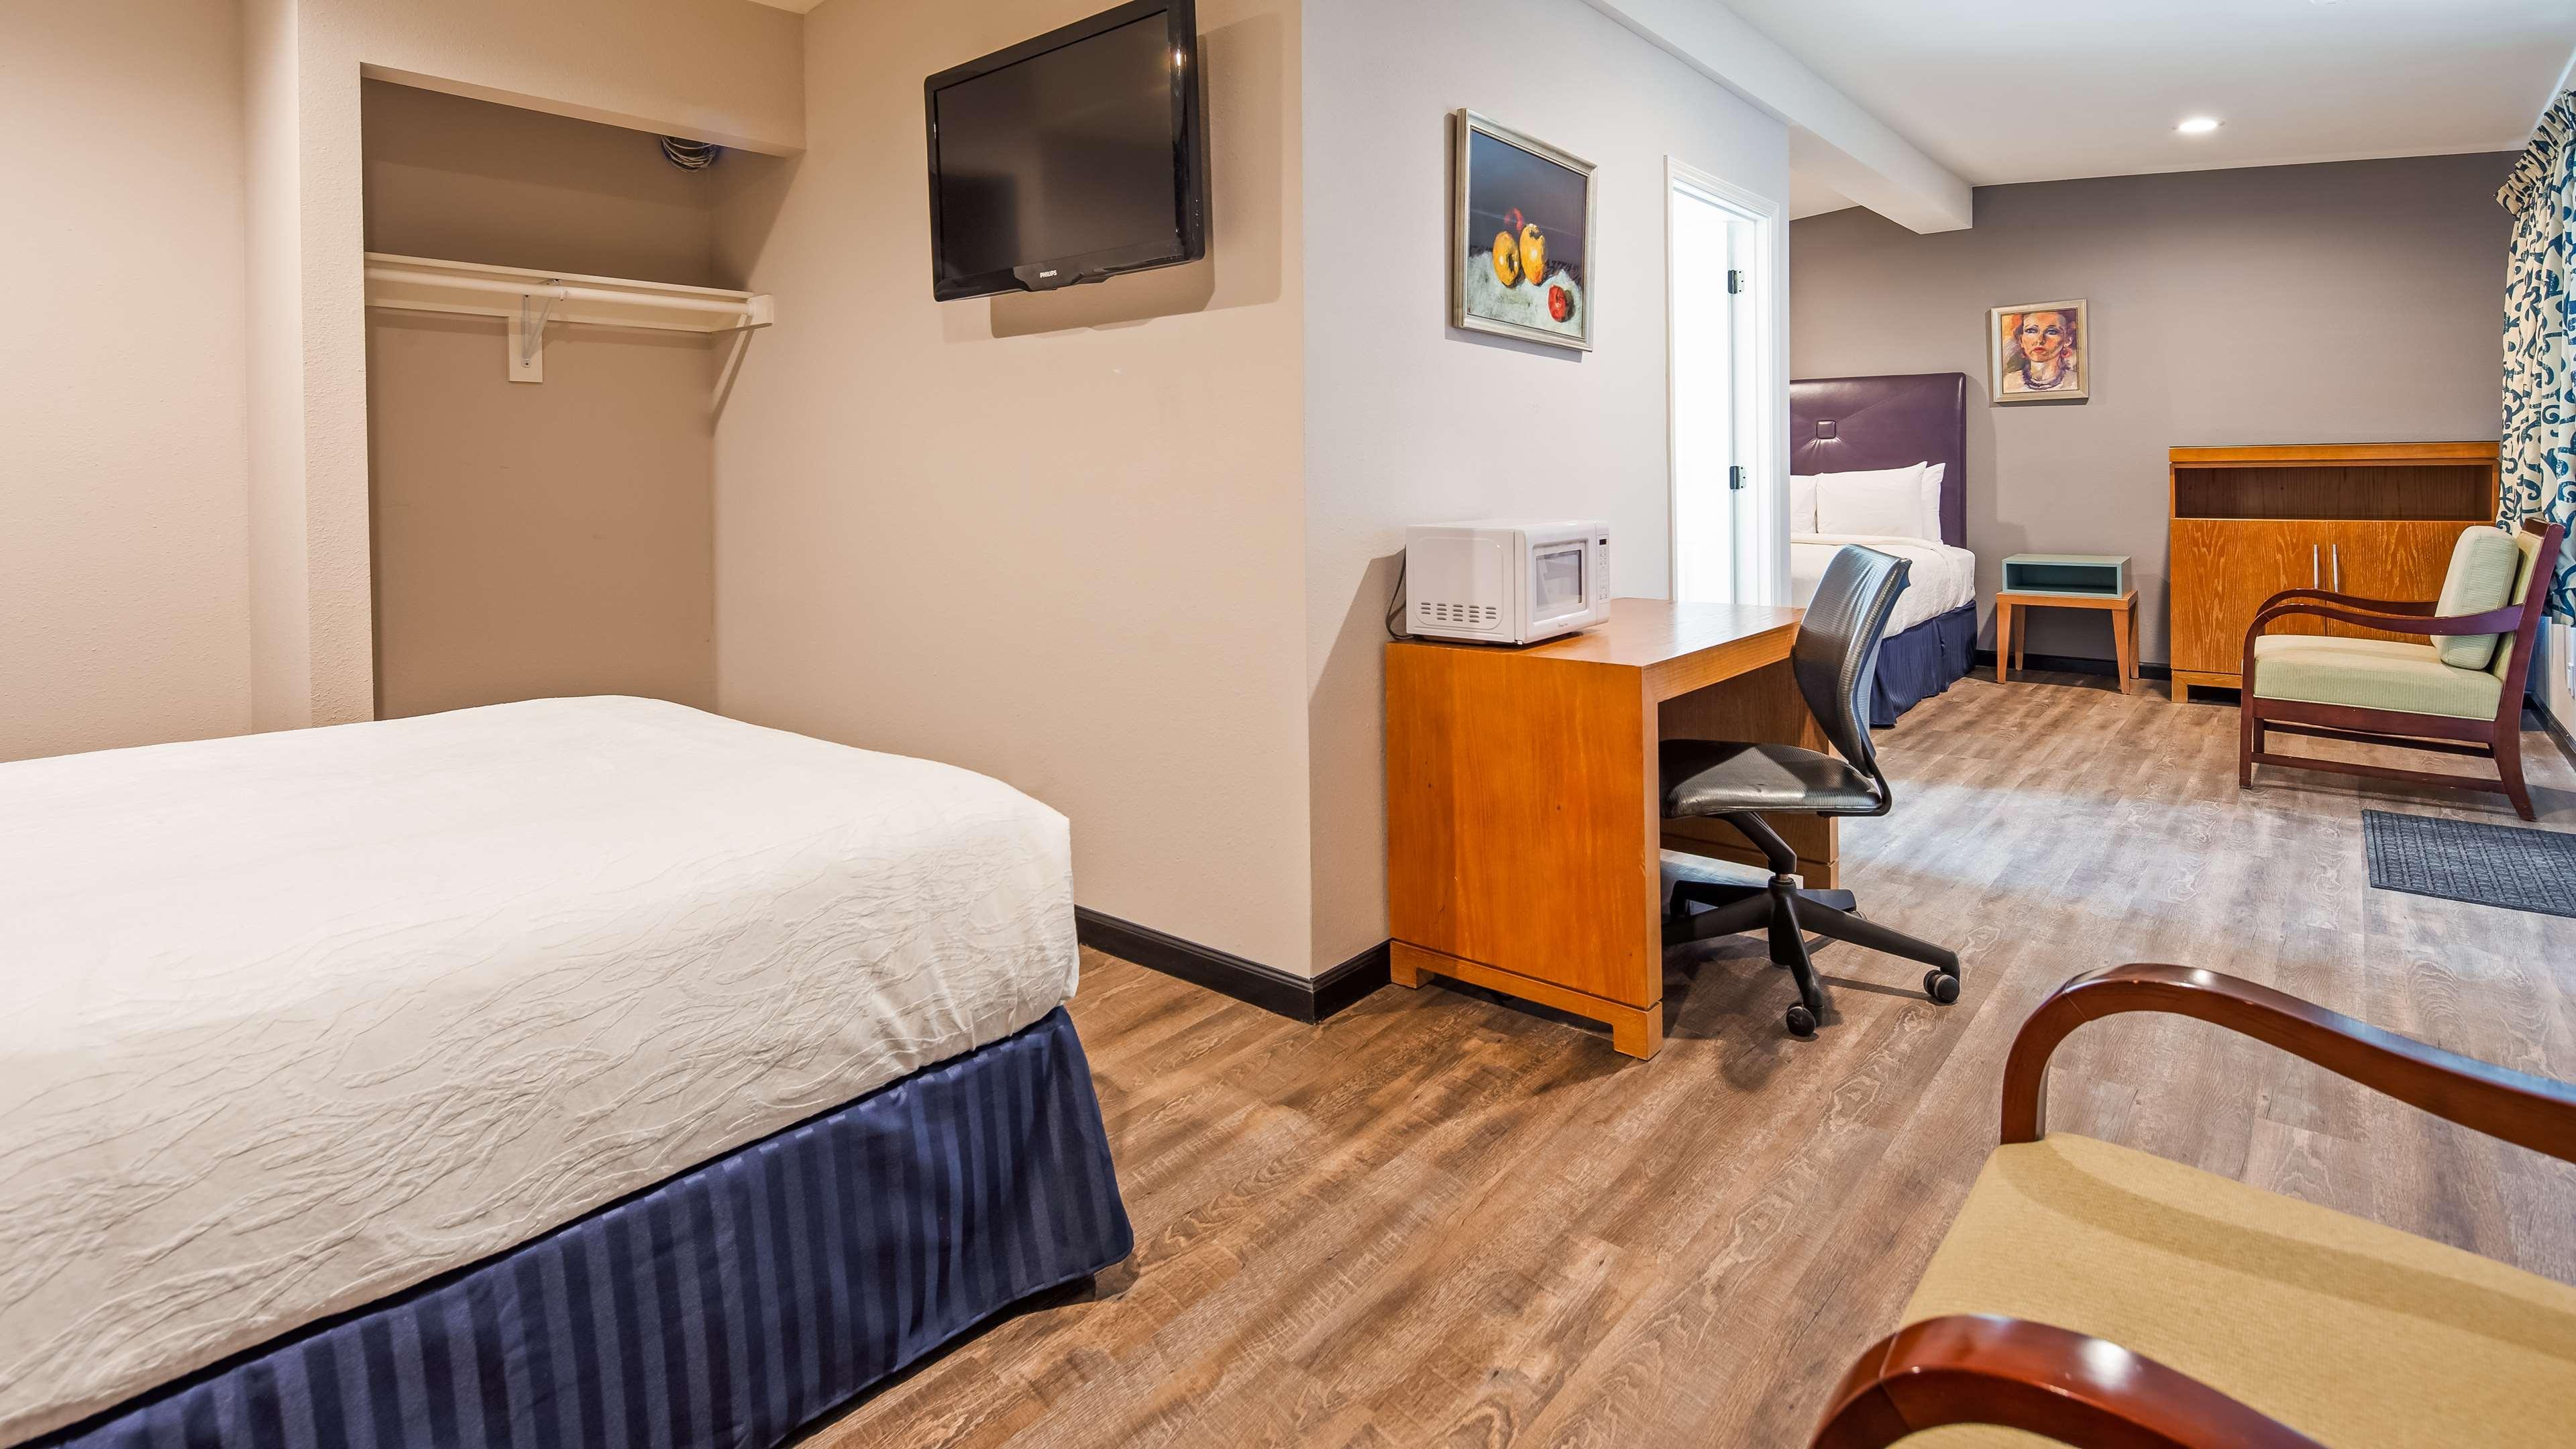 SureStay Hotel by Best Western Ridgecrest image 5